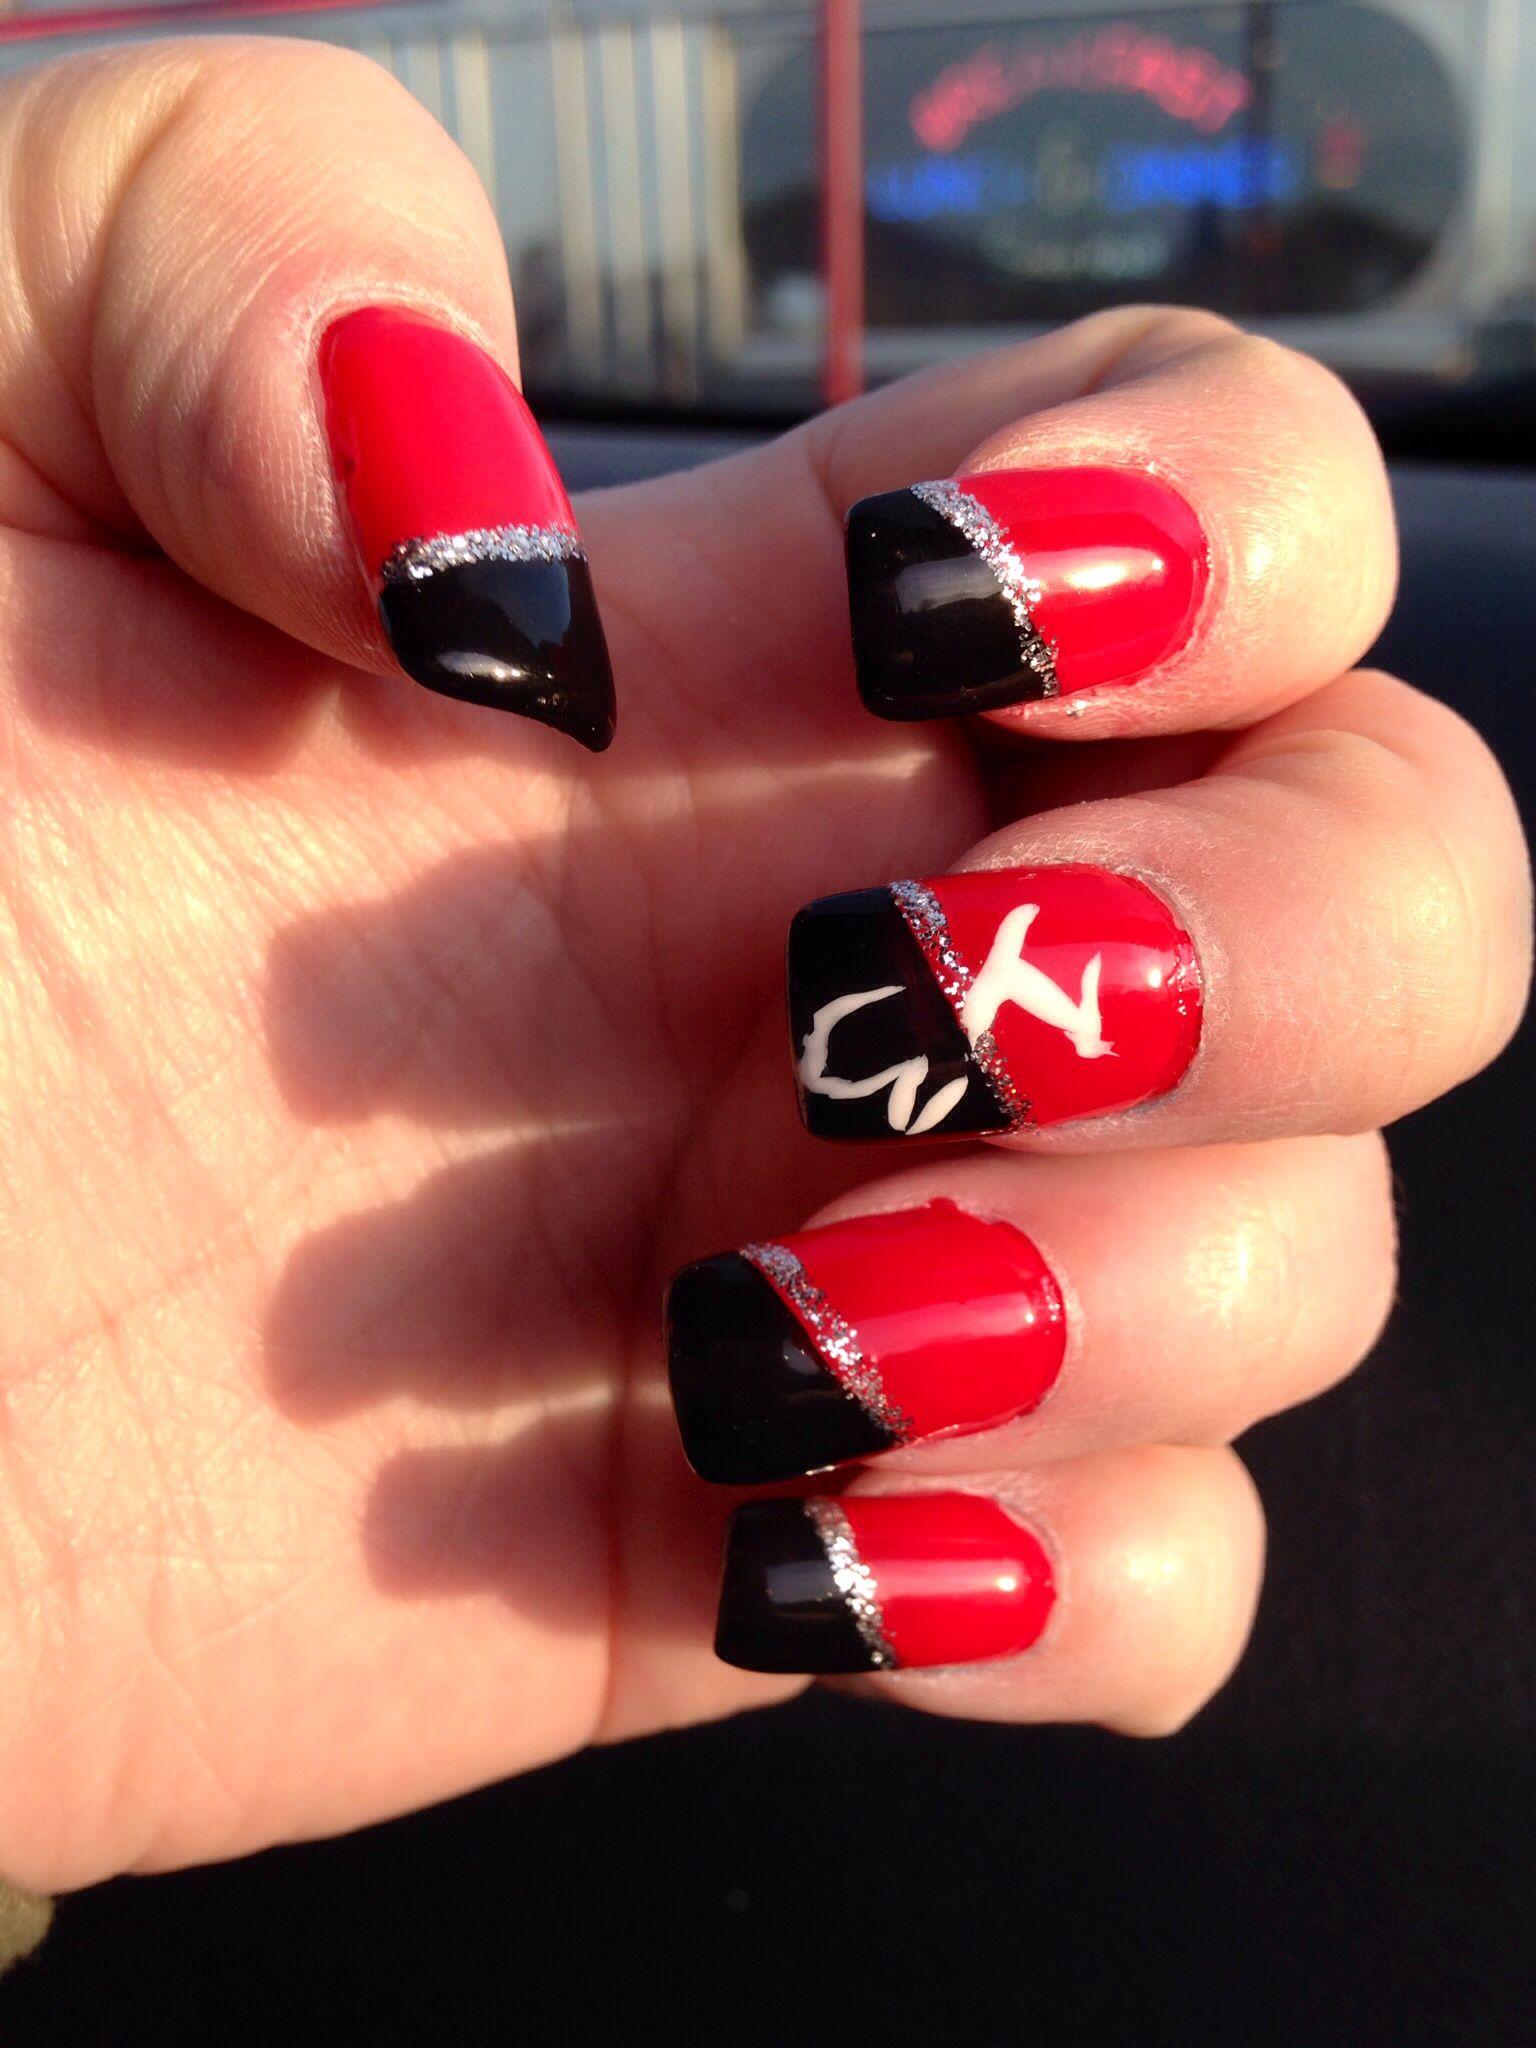 Chicago Bulls Nails #13 Joakim Noah Center In Nba